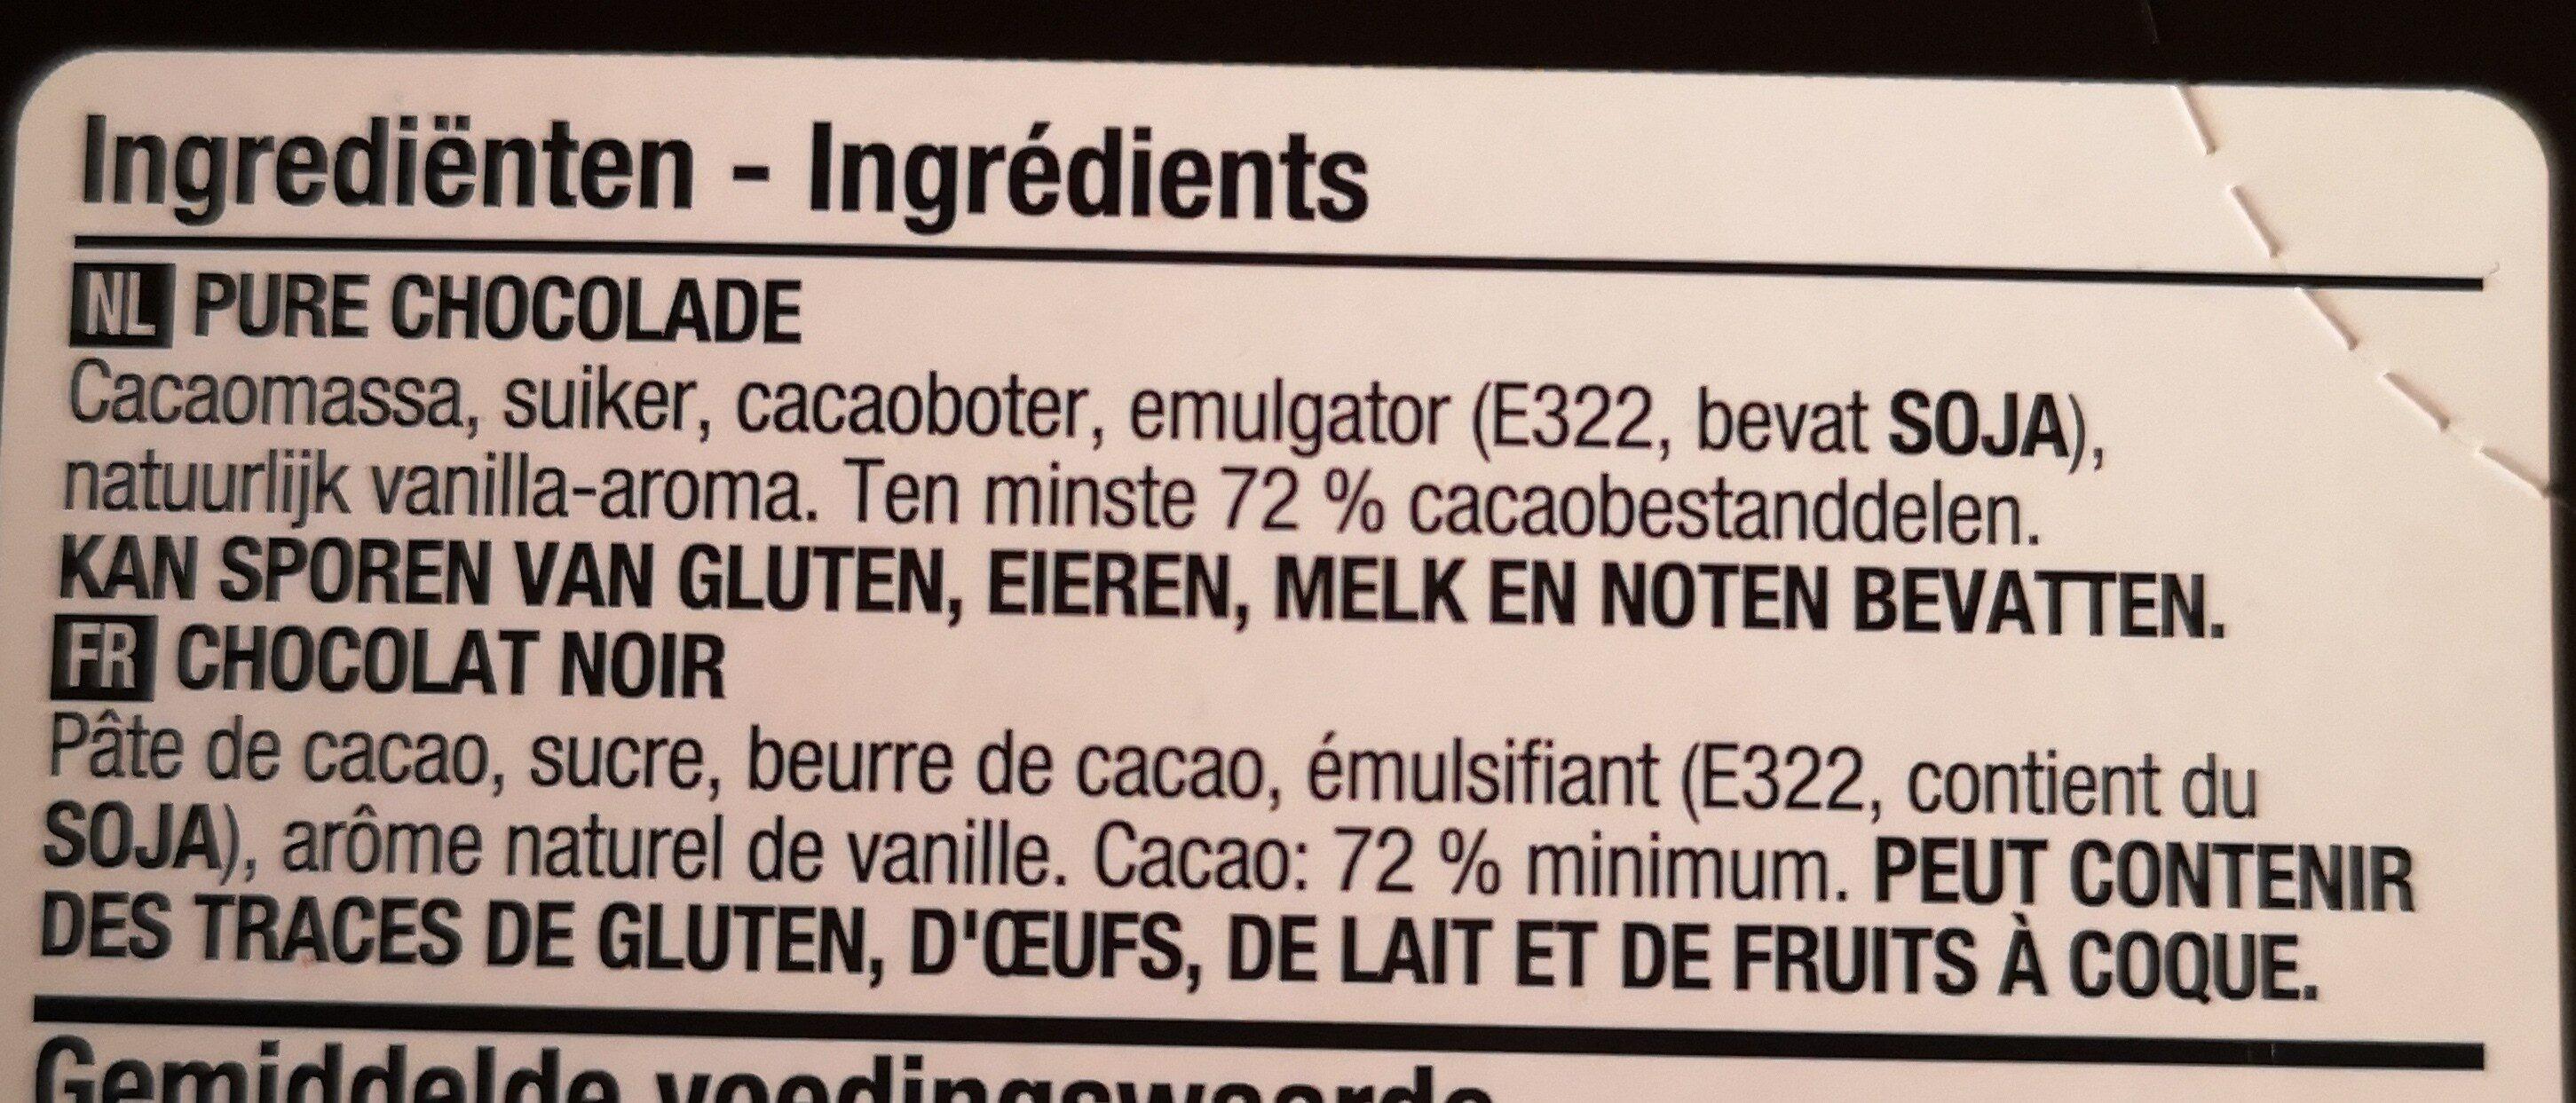 Chocolat noir 72% cacao - Ingredients - en